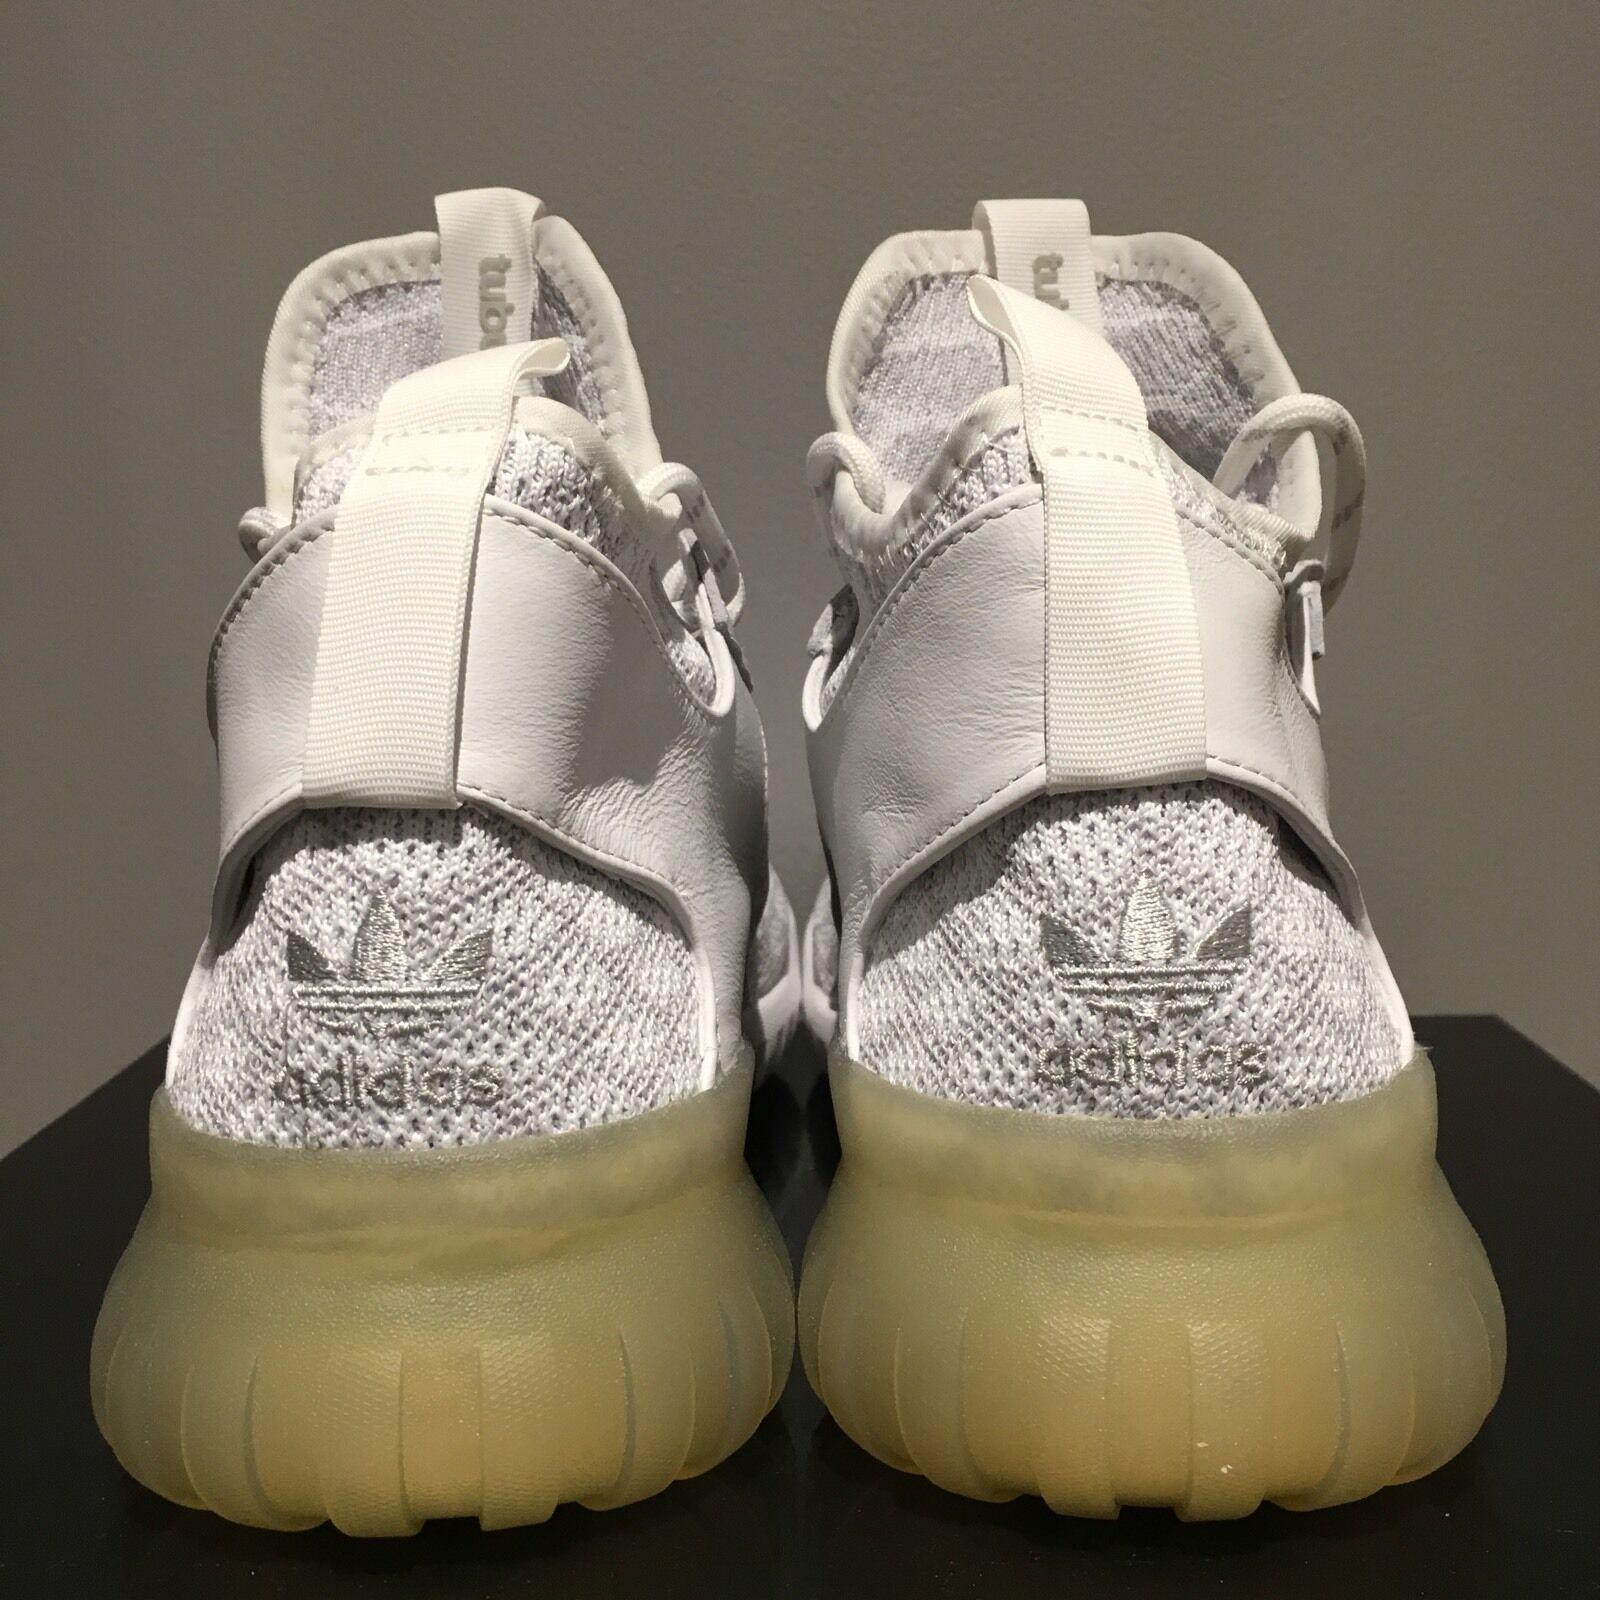 « new york - primeknit adidas tubulaire exclusivités - york x taille 9 - aq2693 894893